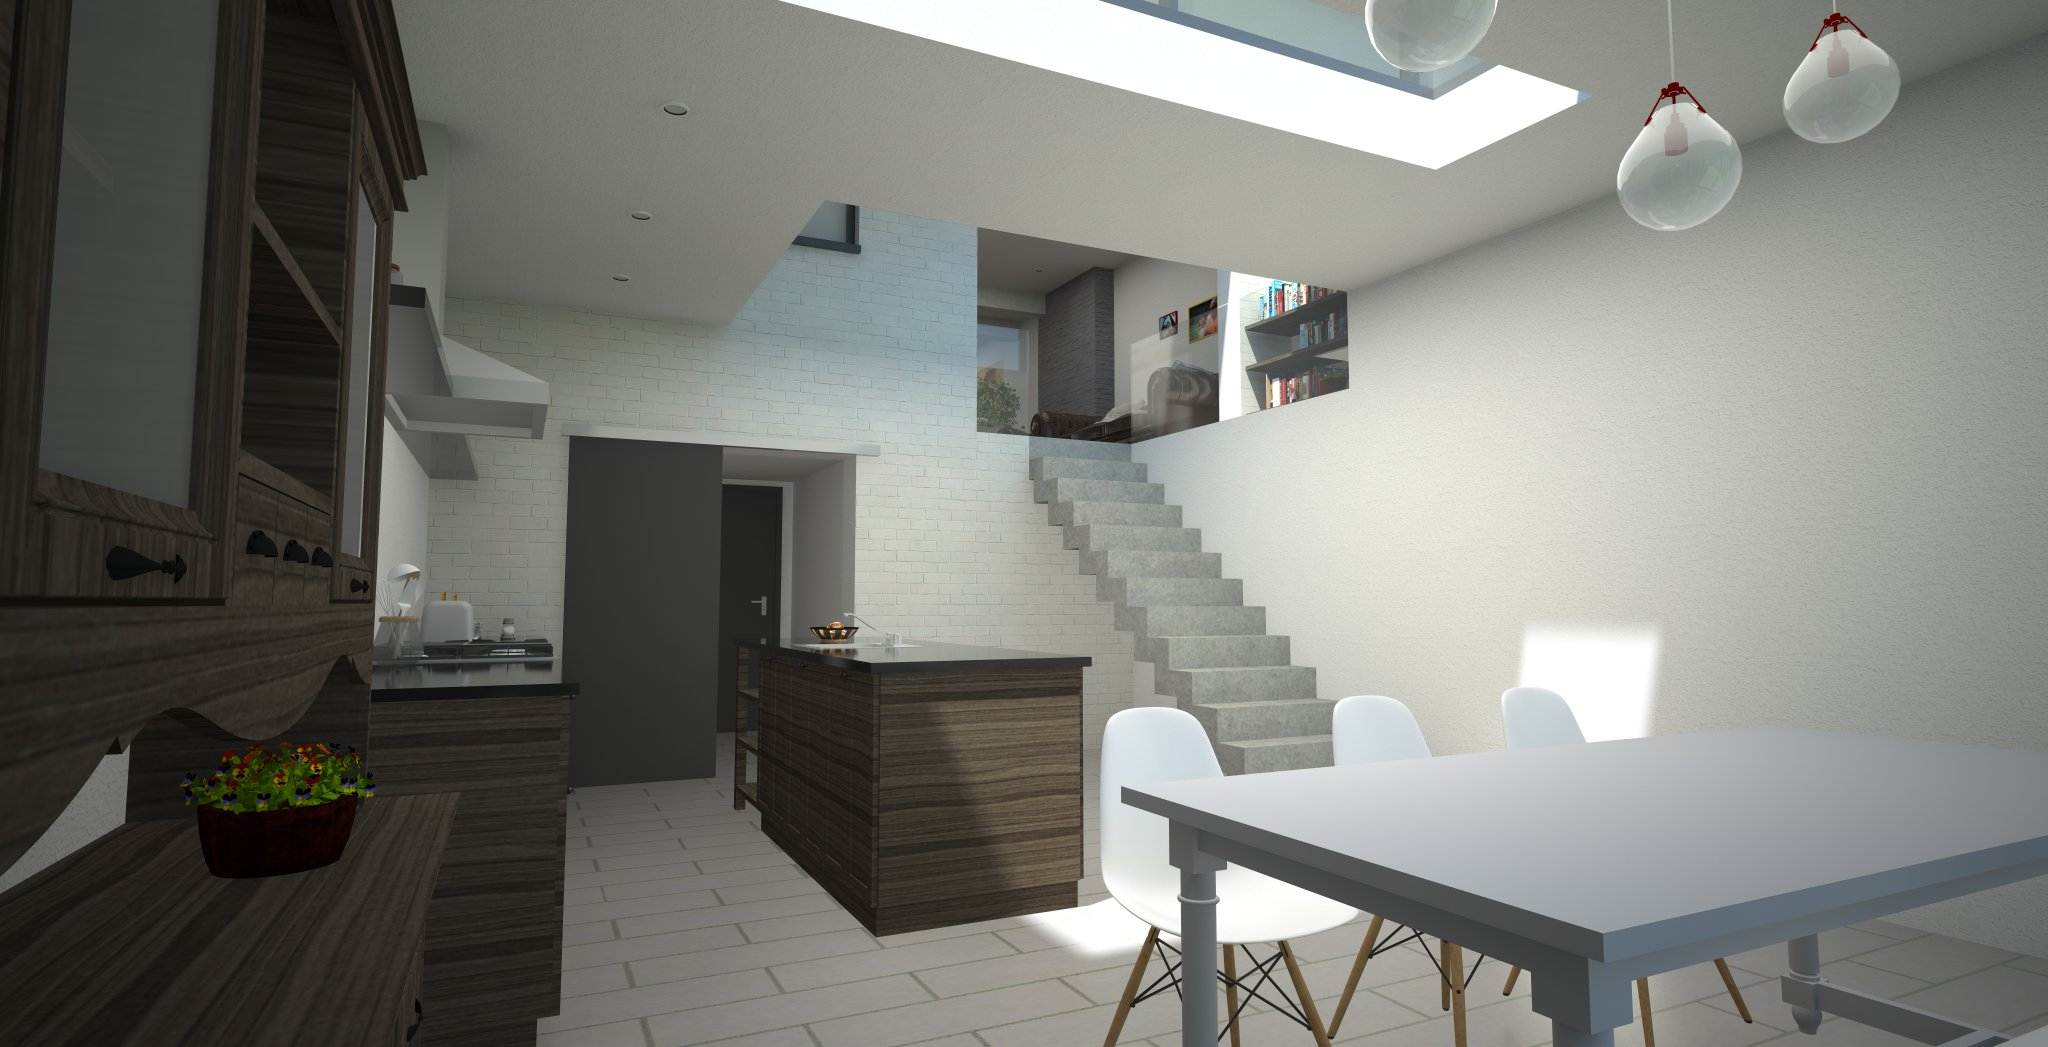 Woonkamer hal trap en keuken schilderen hot girls wallpaper - Eetkamer en woonkamer ...